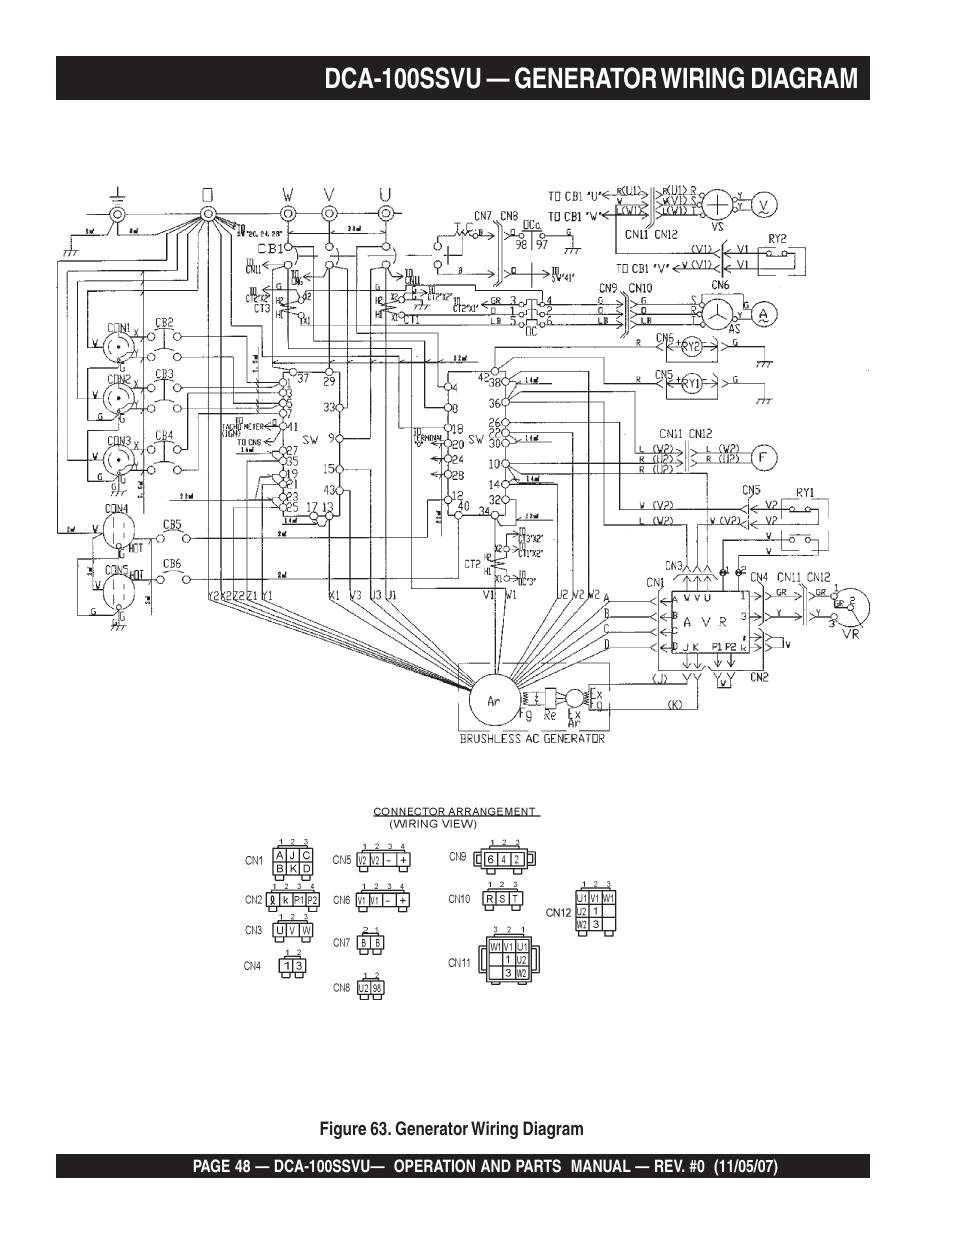 medium resolution of dca 100ssvu generator wiring diagram multiquip mq power whisperwatt 60 hz generator dca